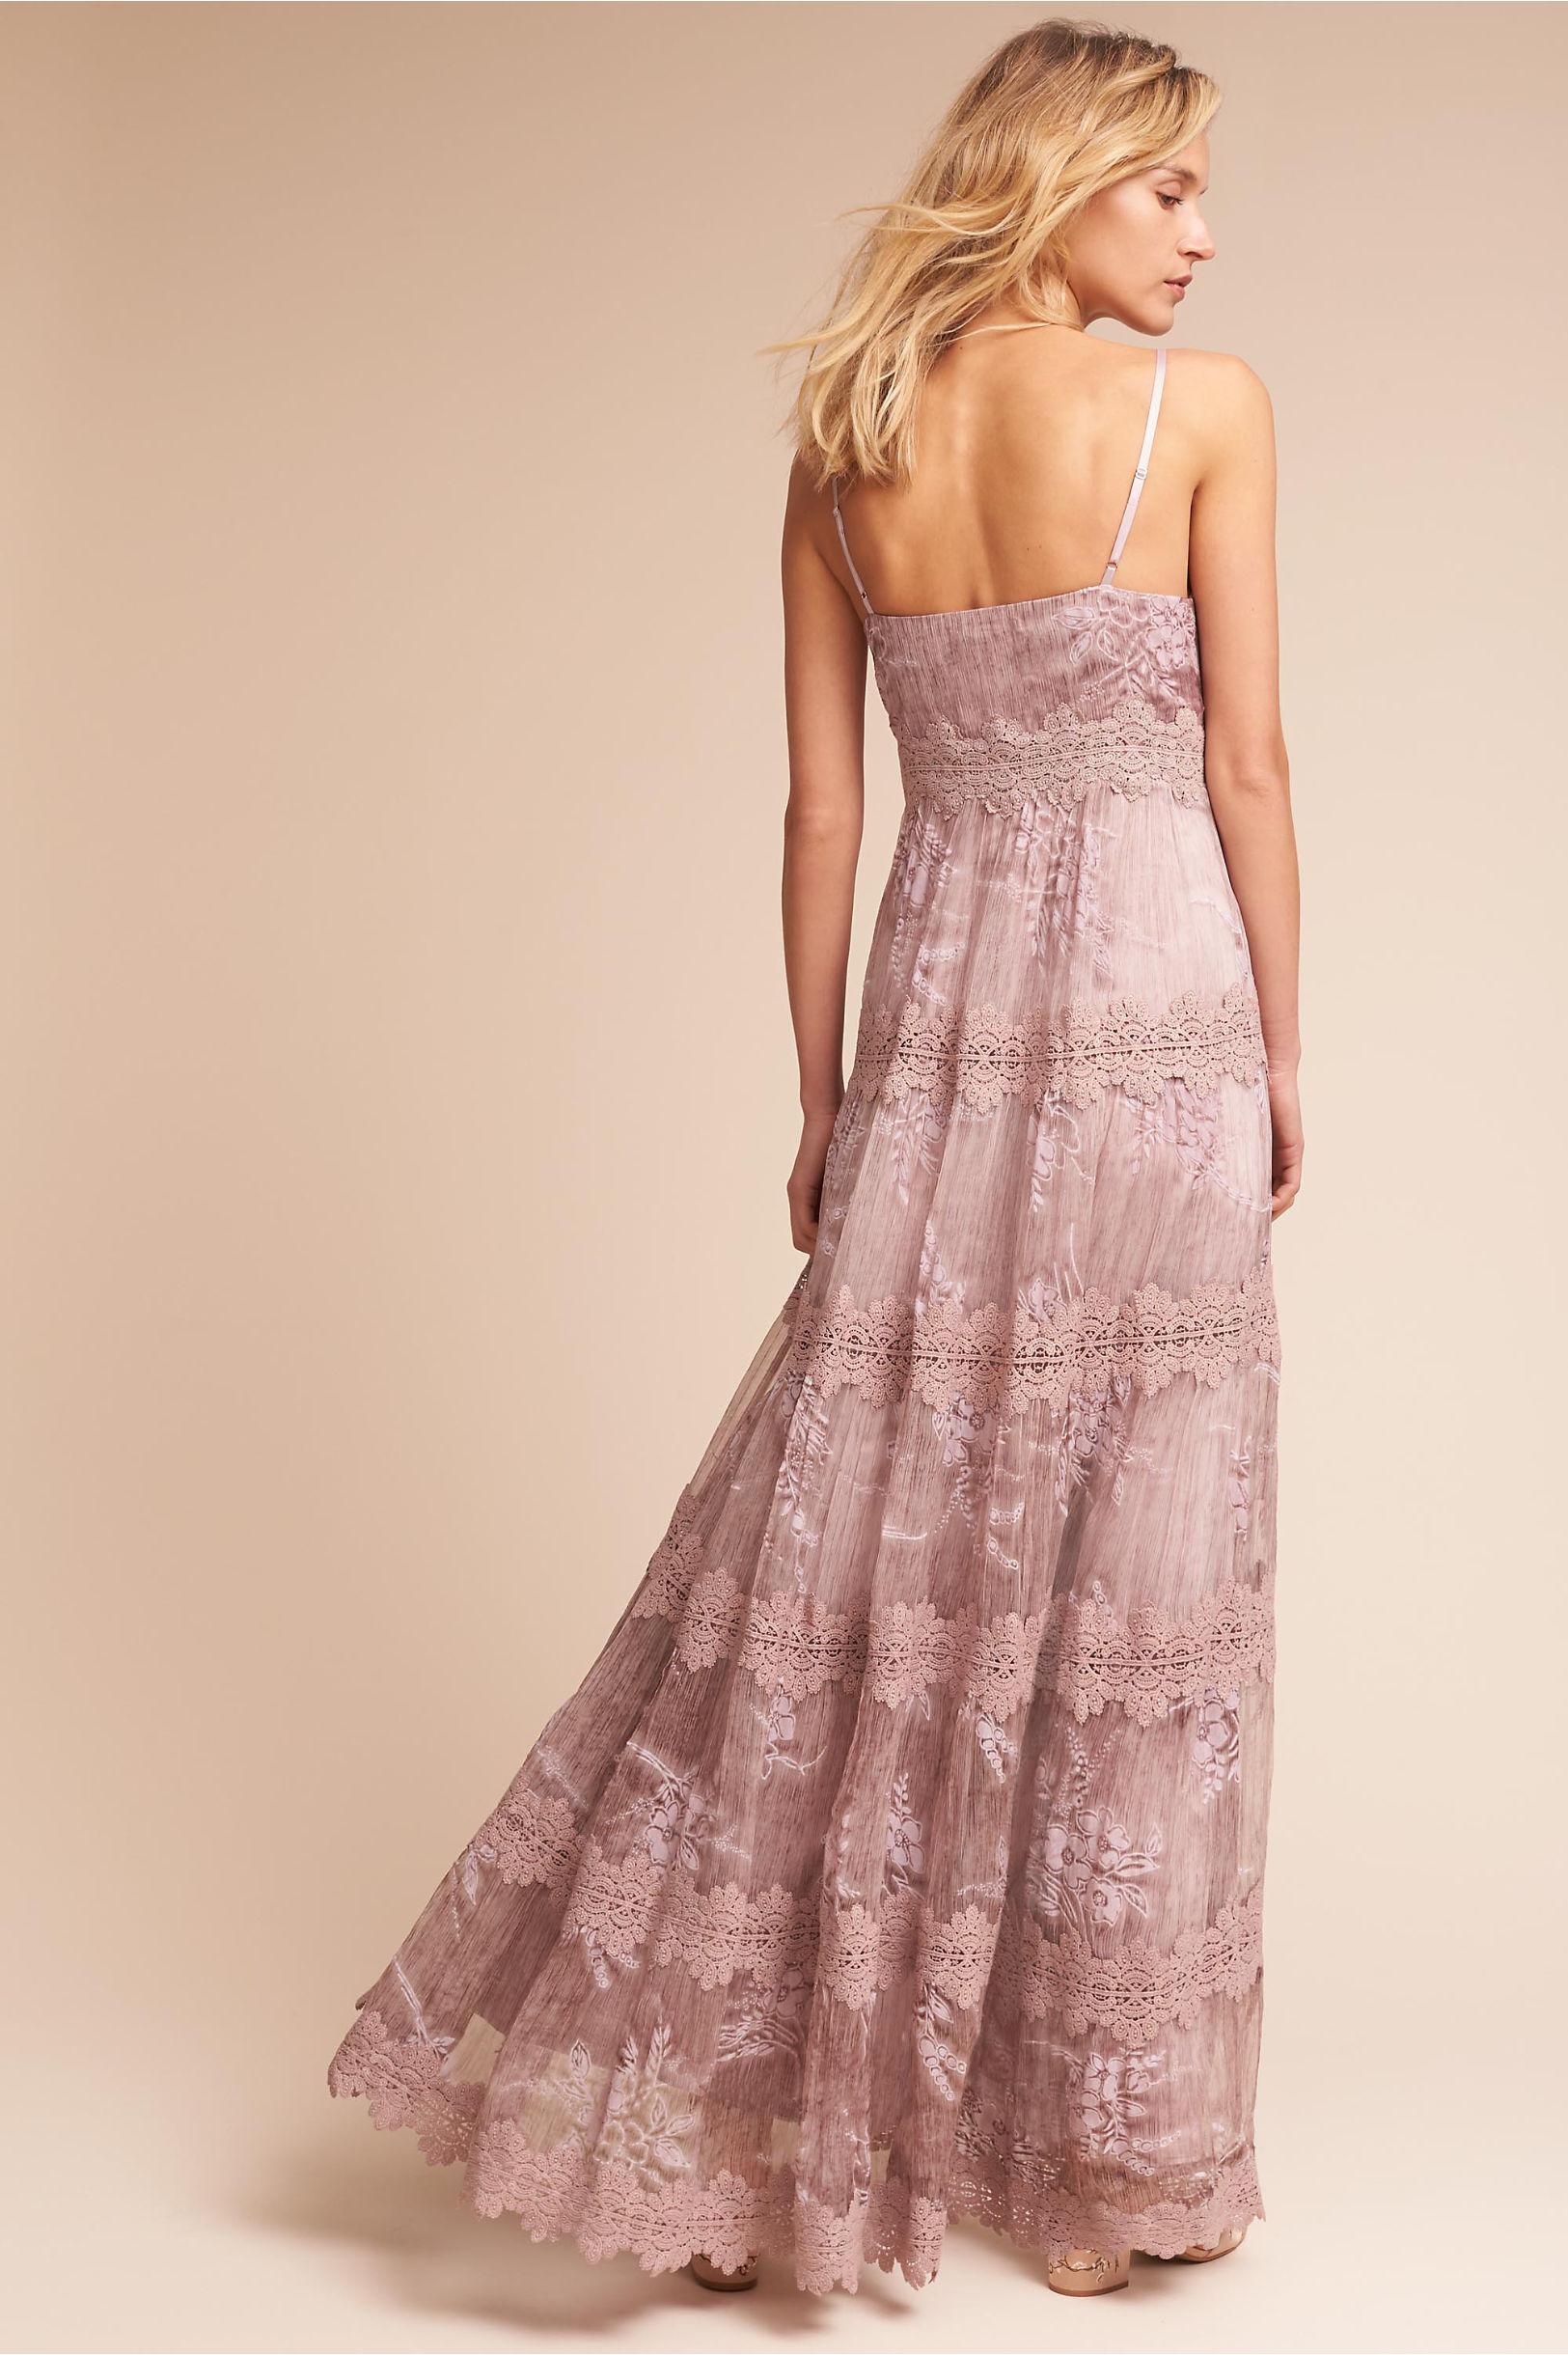 Joni Dress in Sale | BHLDN